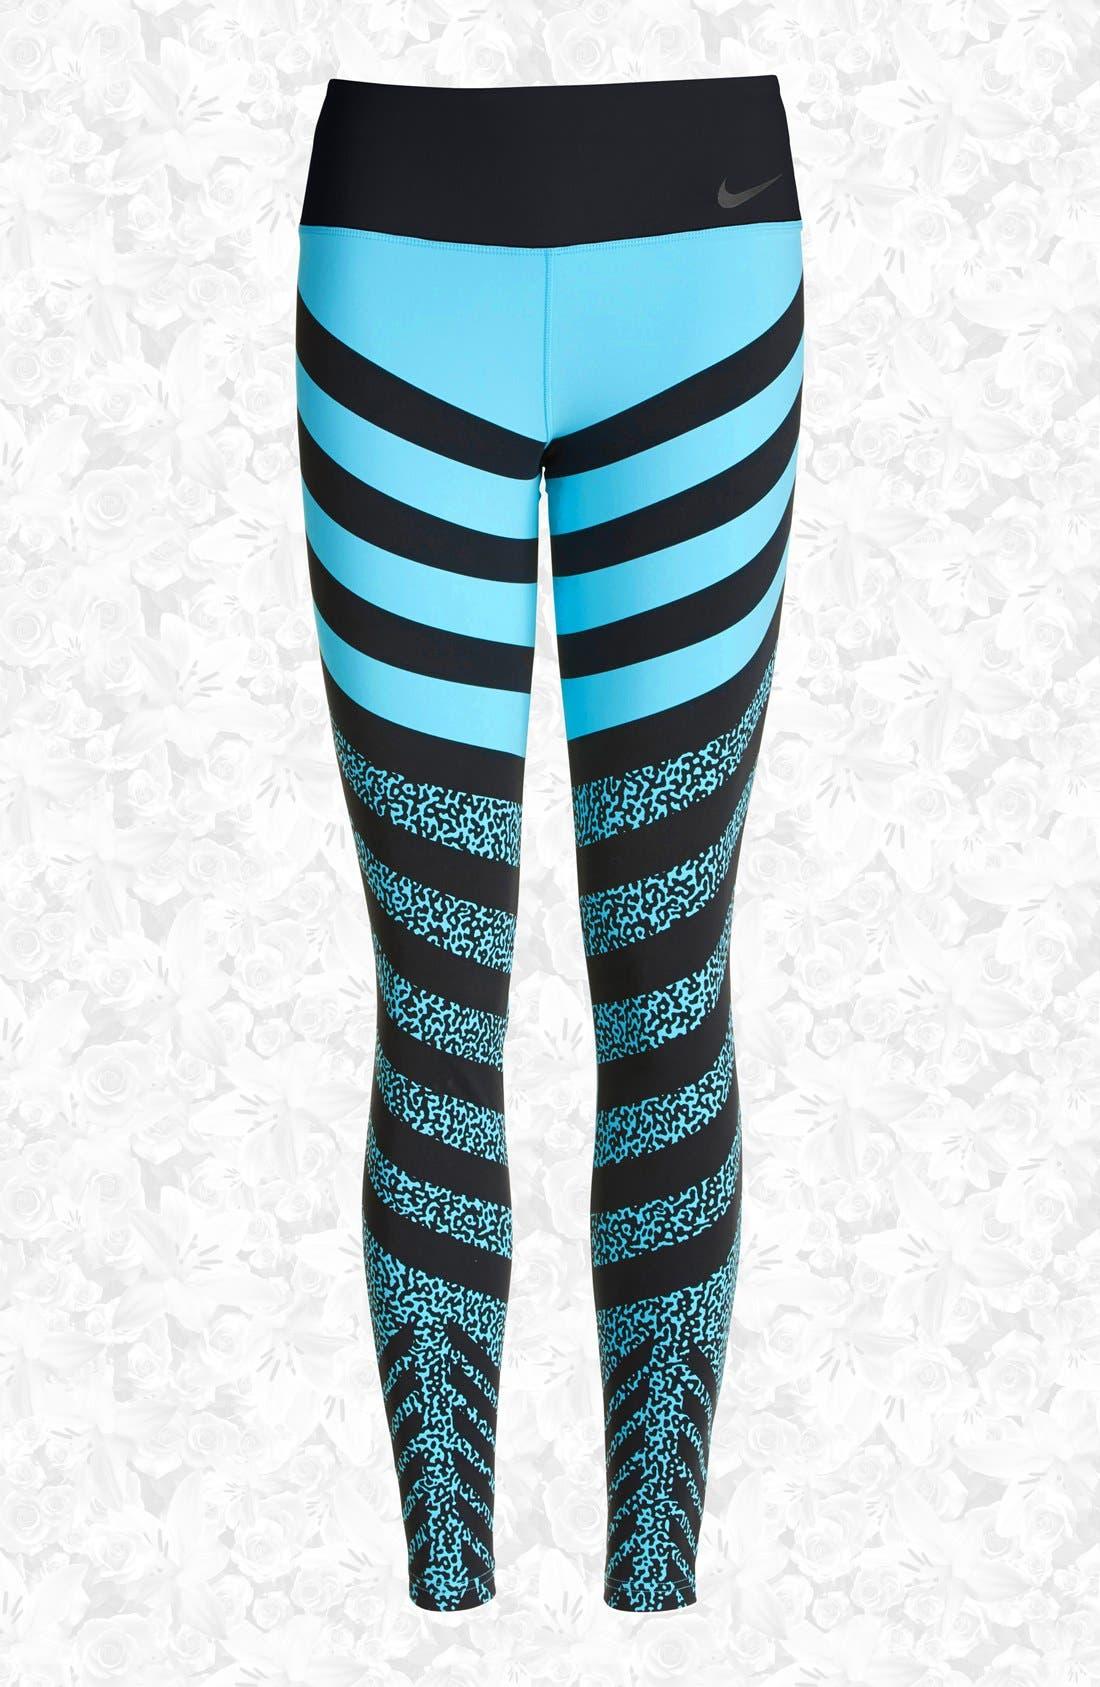 Main Image - Nike 'Legendary - Mezzo Zebra' Training Tights